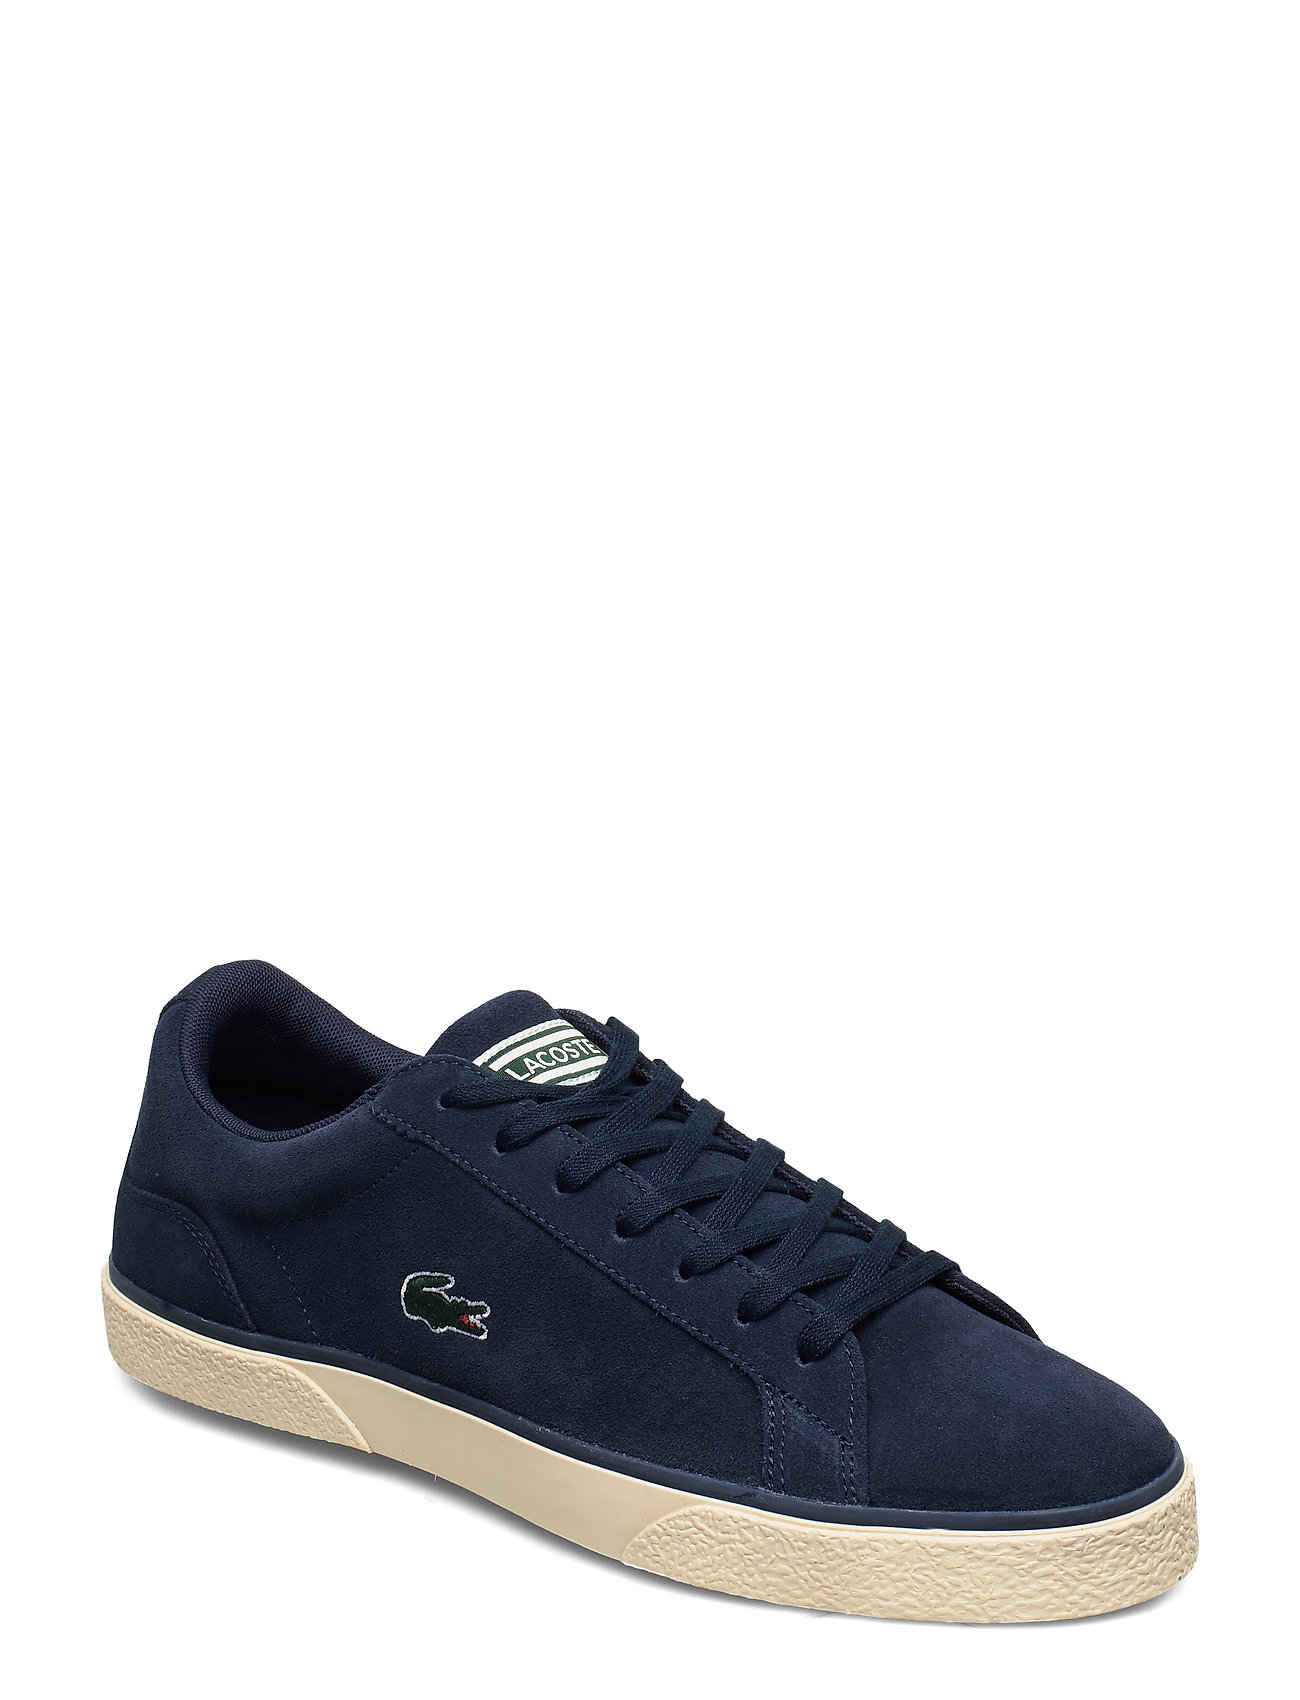 LACOSTE Lerond 319 4 Cma Niedrige Sneaker Blau LACOSTE SHOES